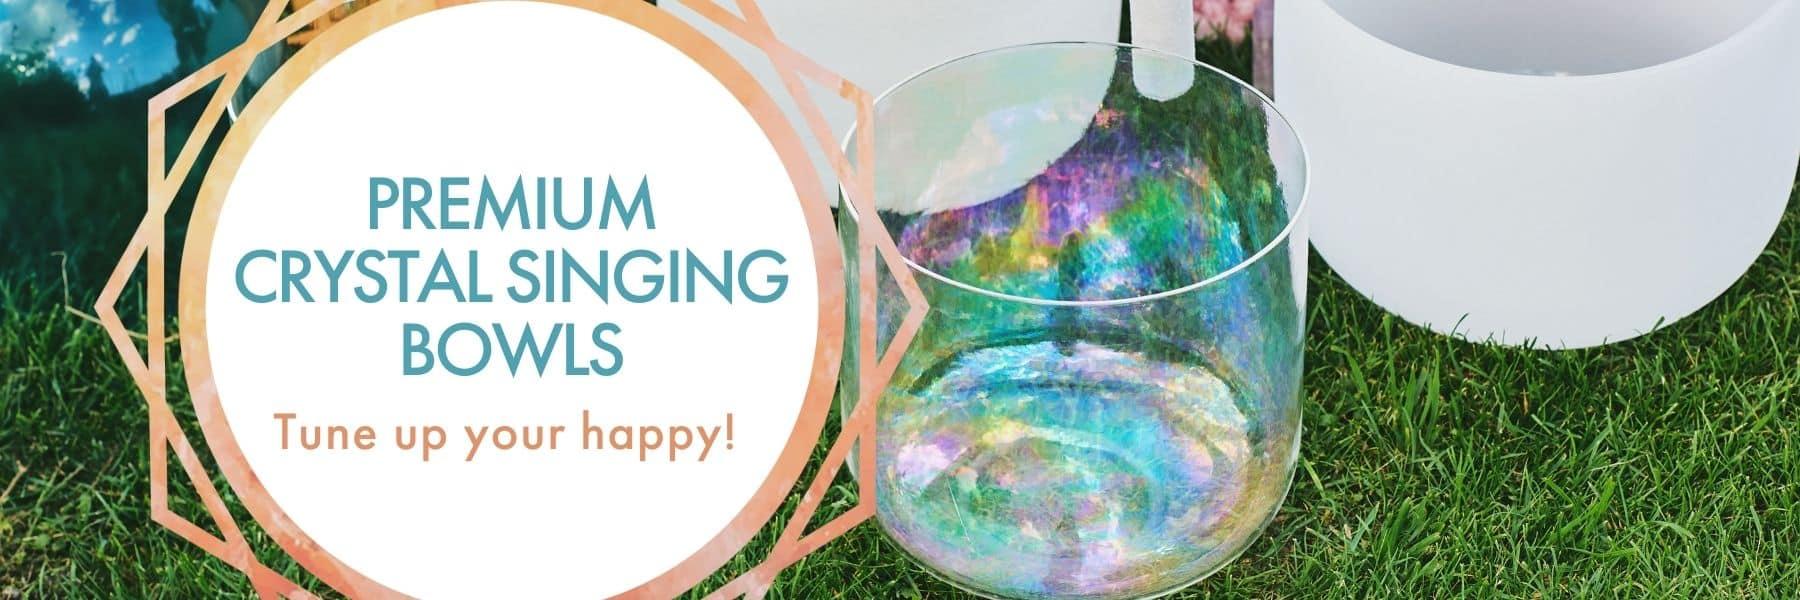 Banner: Premium Crystal Singing Bowls; beautiful crystal singing bowls being played in the grass